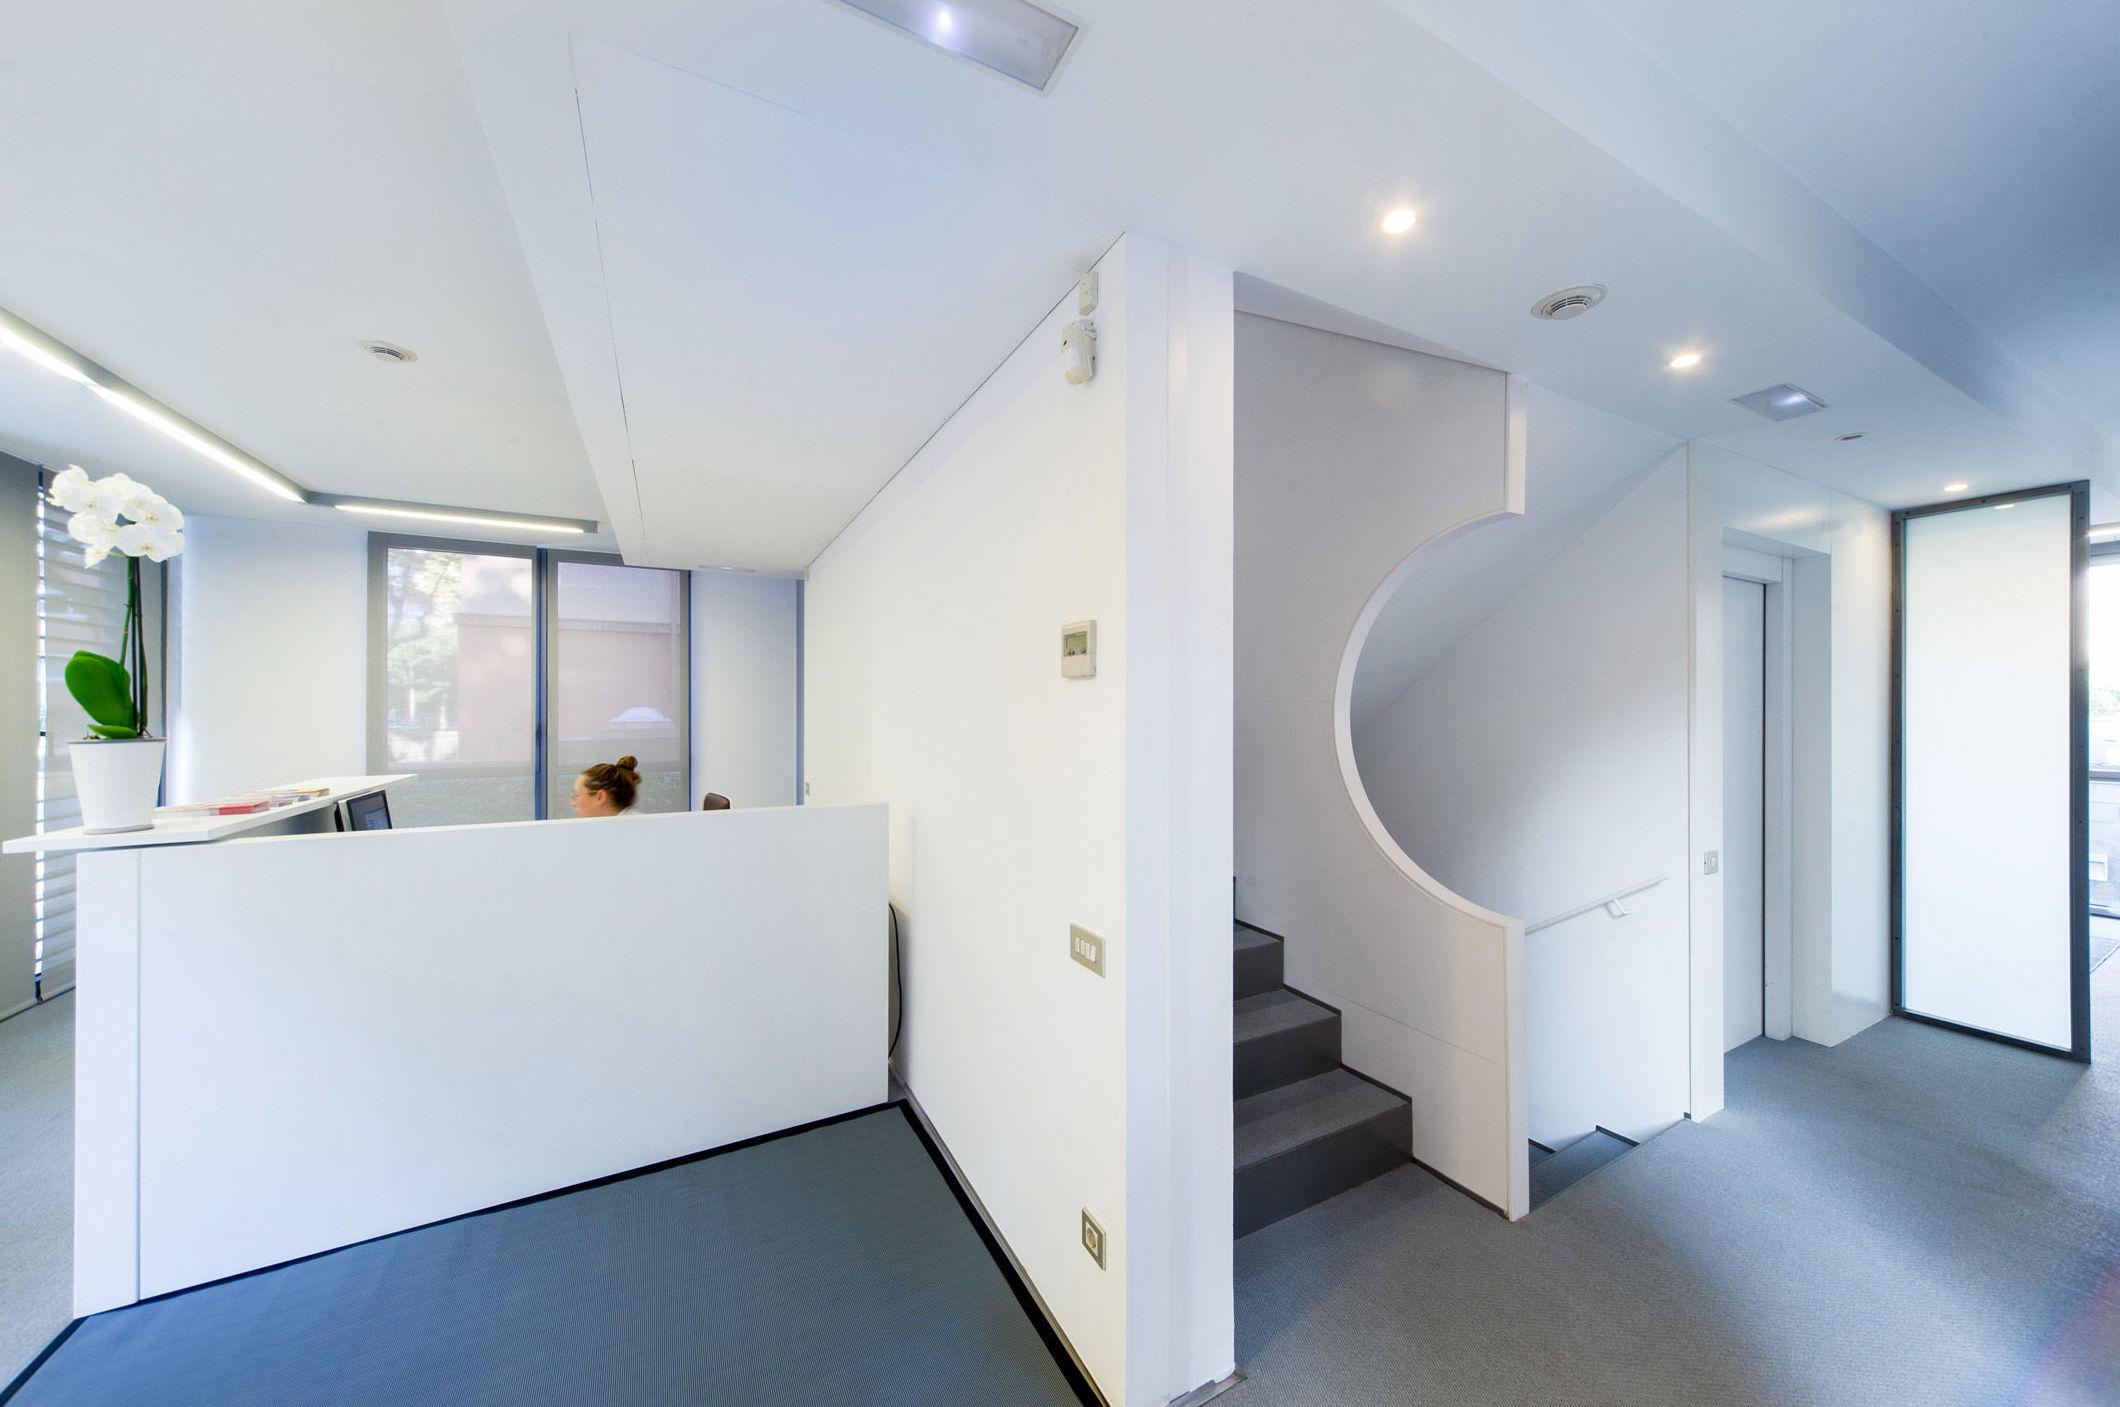 Foto 4 de Centros de estética en Barcelona | Serena Clinic